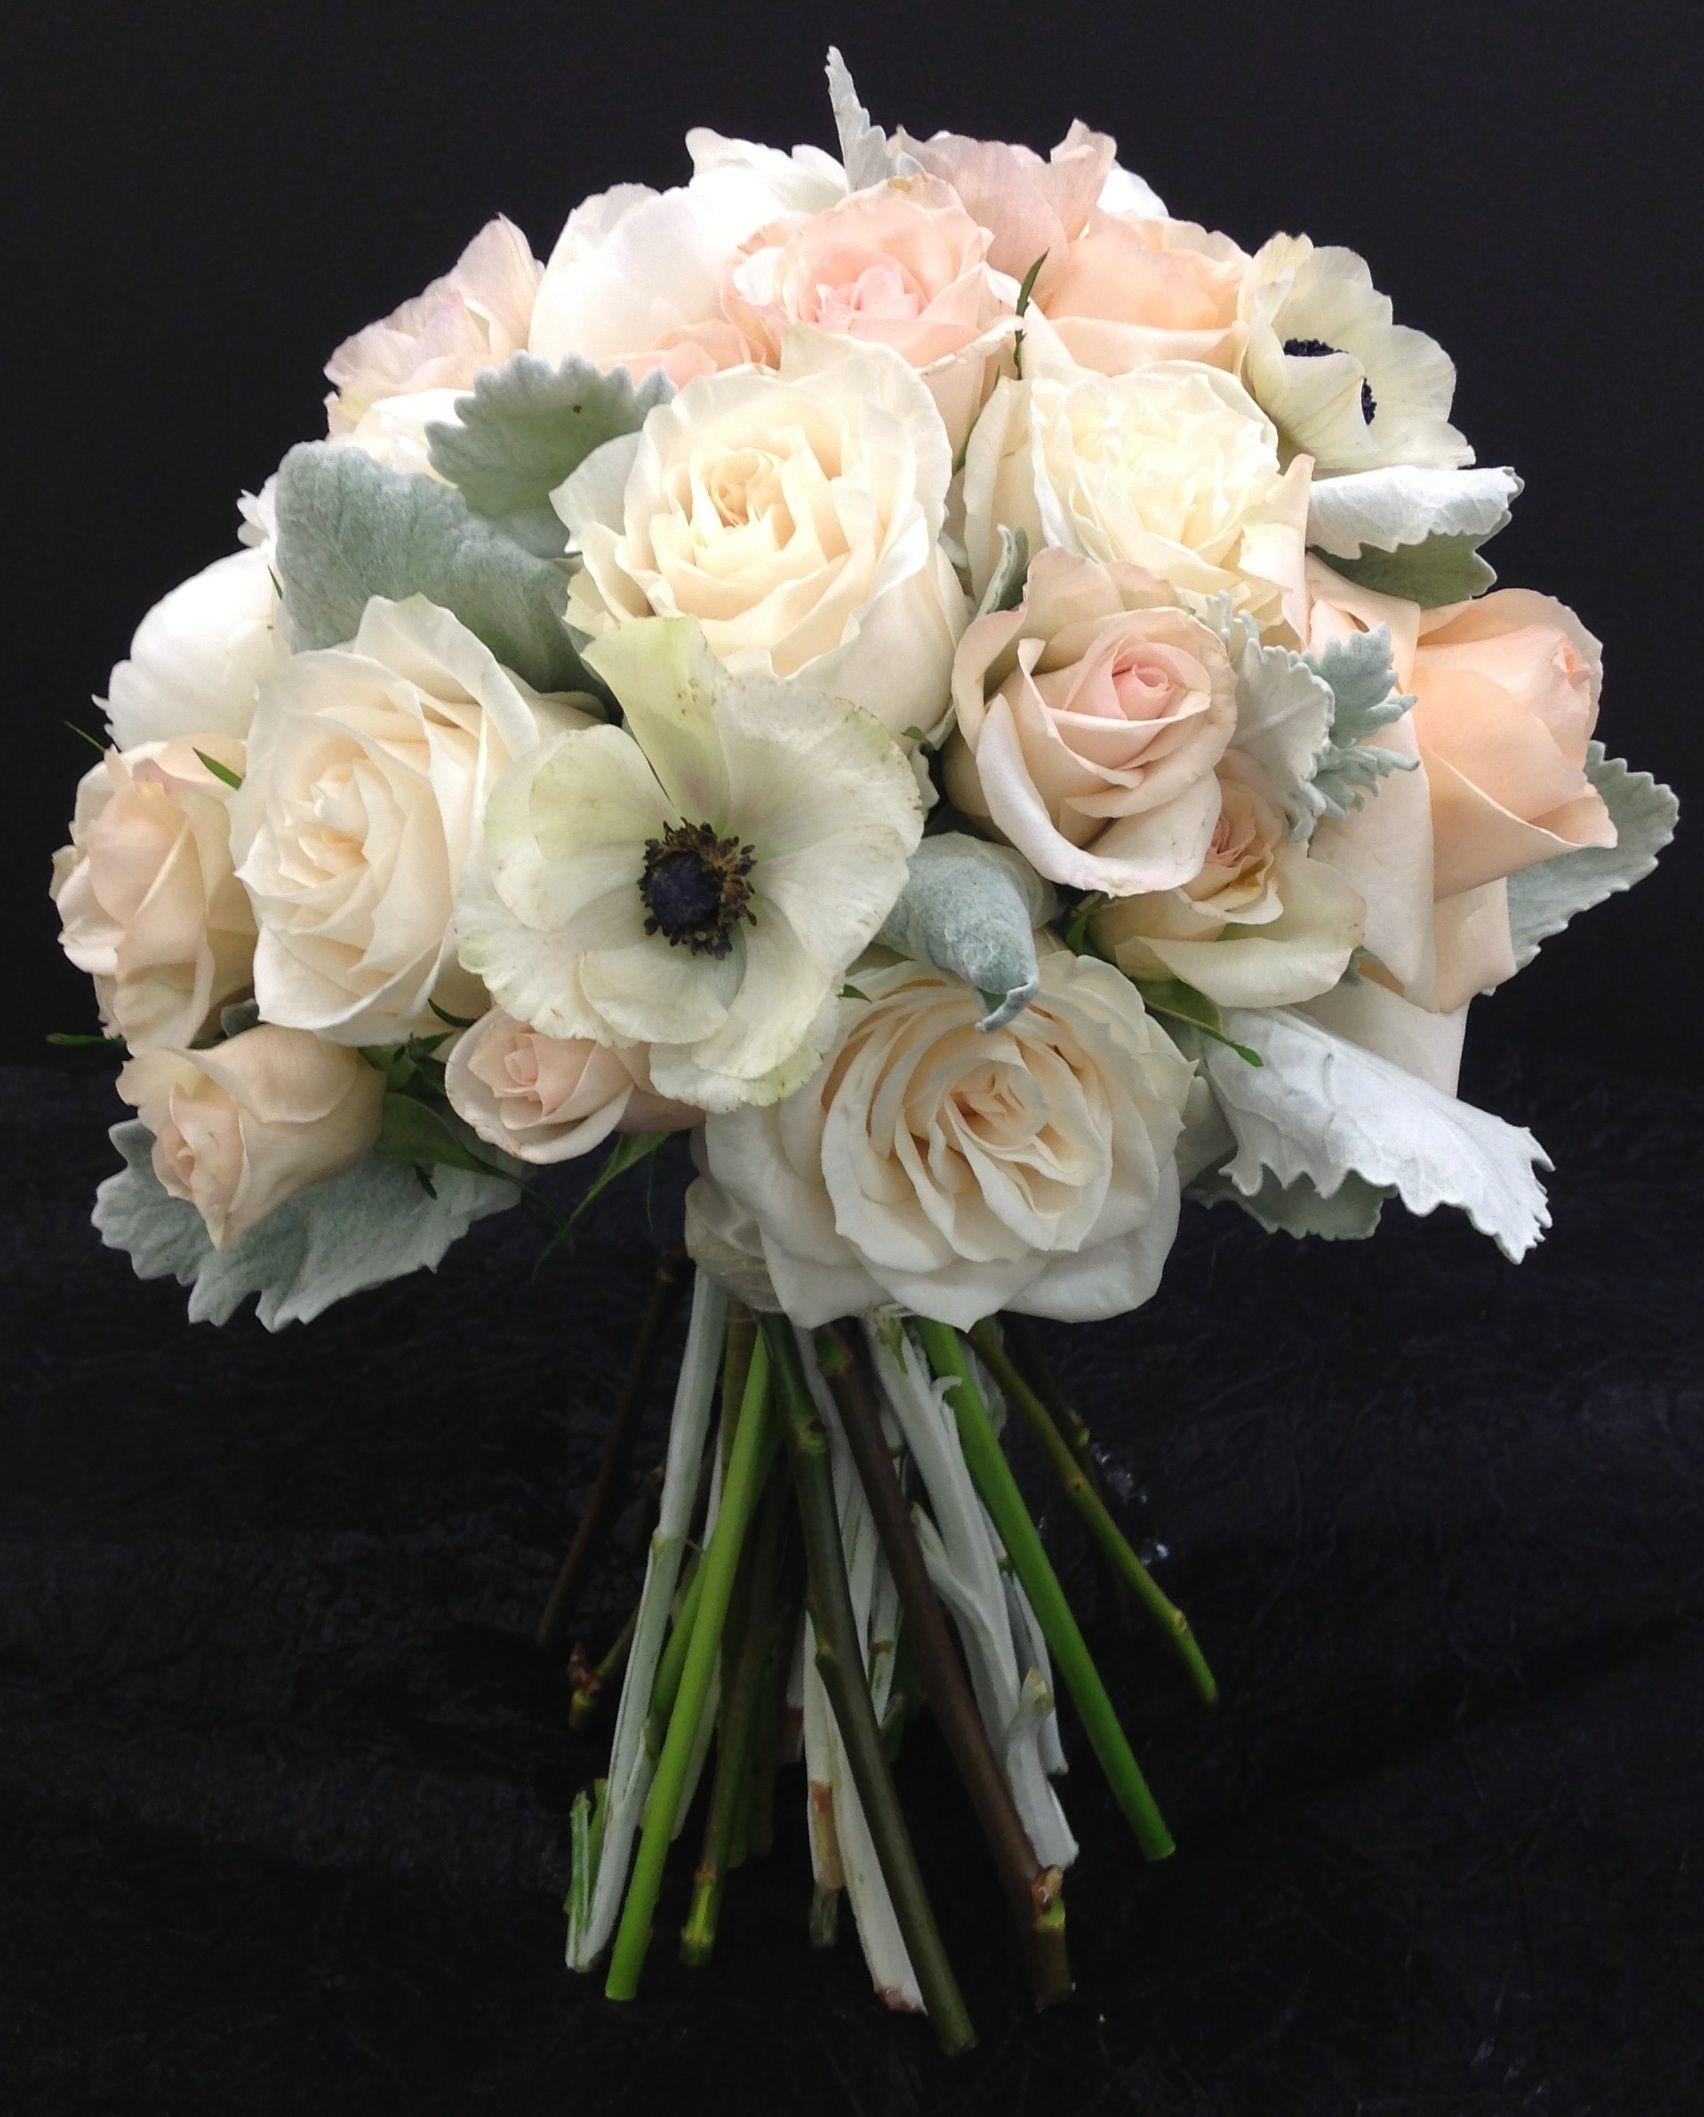 Bridal Bouquet With Roses Gardenias Anenomes Peonies Spray